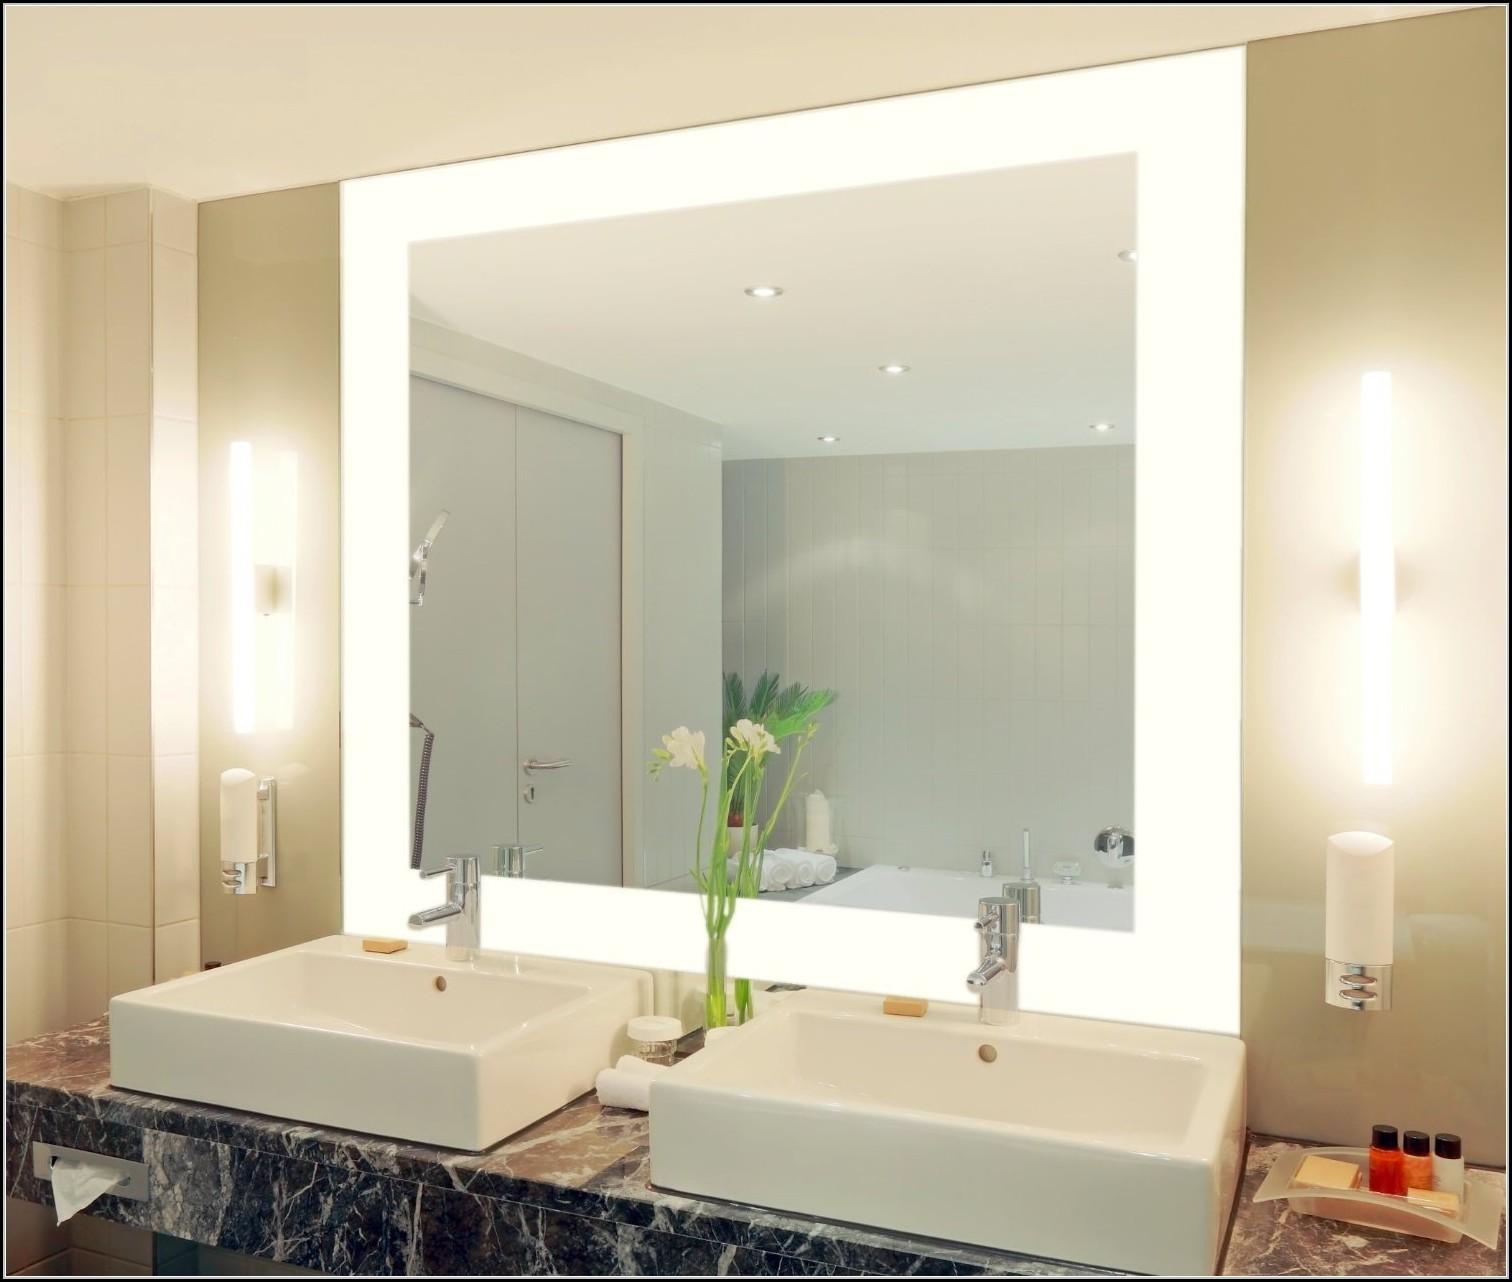 Badspiegel Mit Led Beleuchtung Vella M444l4